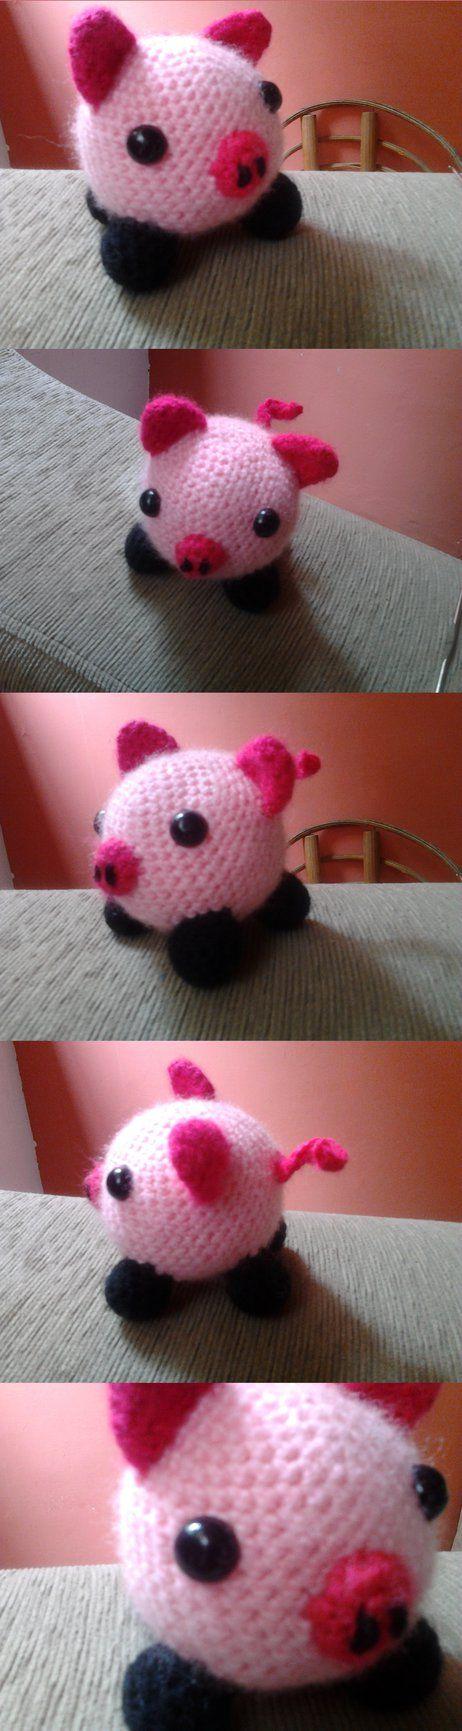 Morabio-Pig by Kaira-Raiton-Kurama on DeviantArt